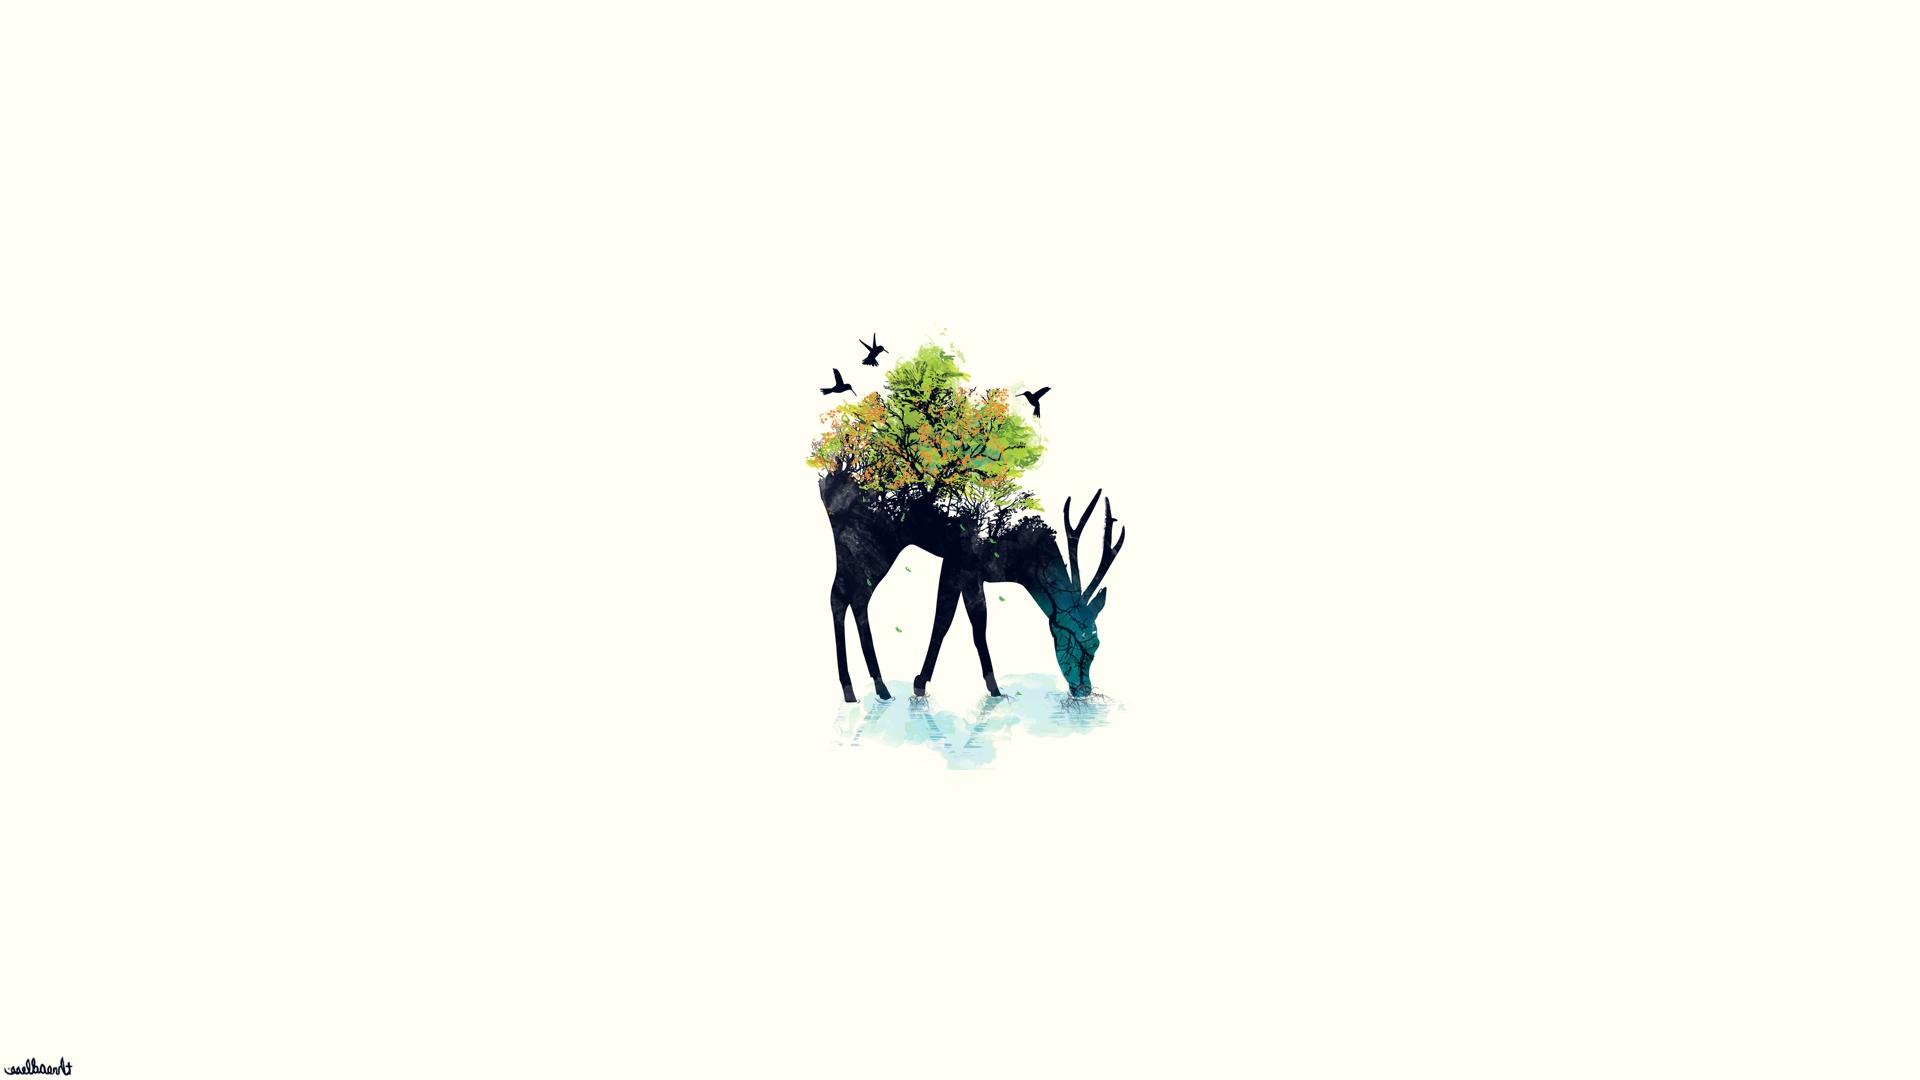 Minimalist Nature Wallpaper